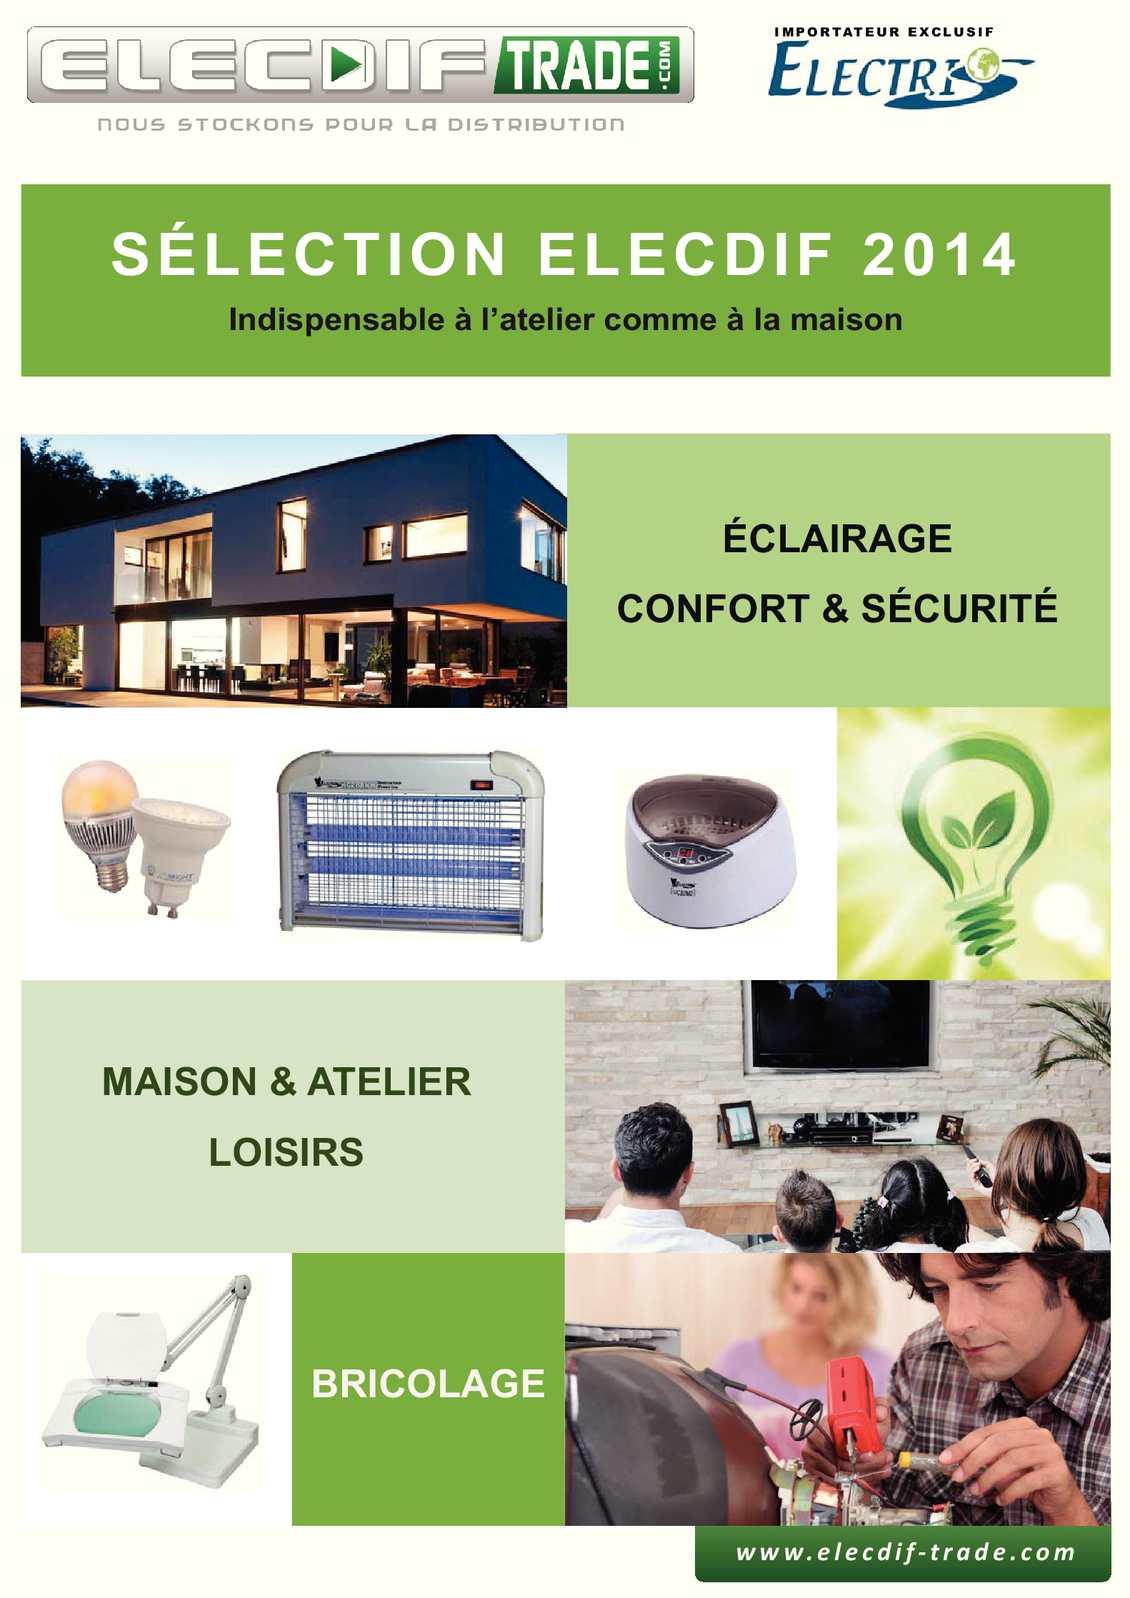 Calaméo TradeBrochure Calaméo Elecdif Import TradeBrochure Produits Elecdif 9ID2WHE